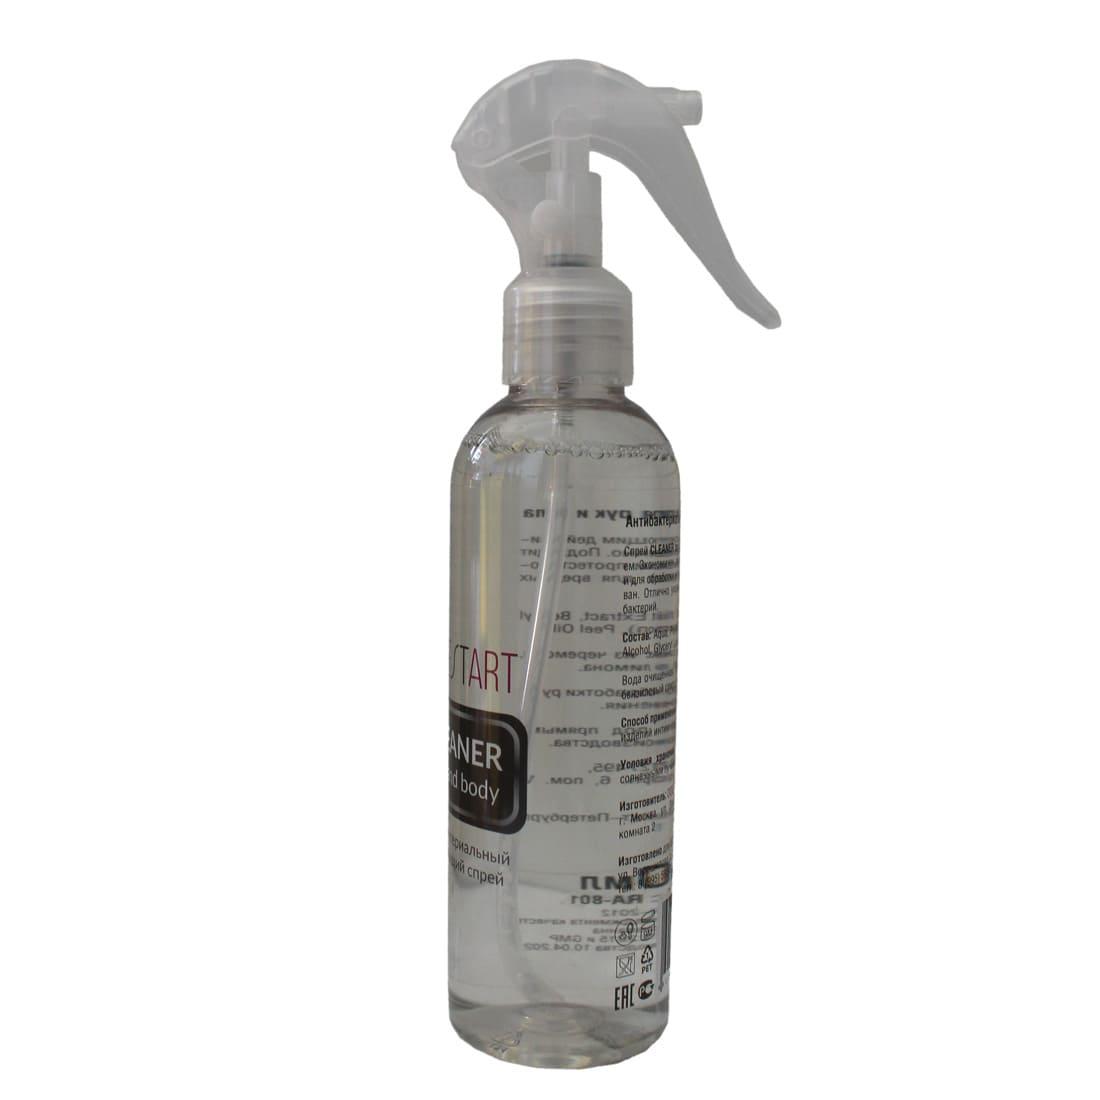 Спрей очищающий CLEANER toy and body, 200 мл